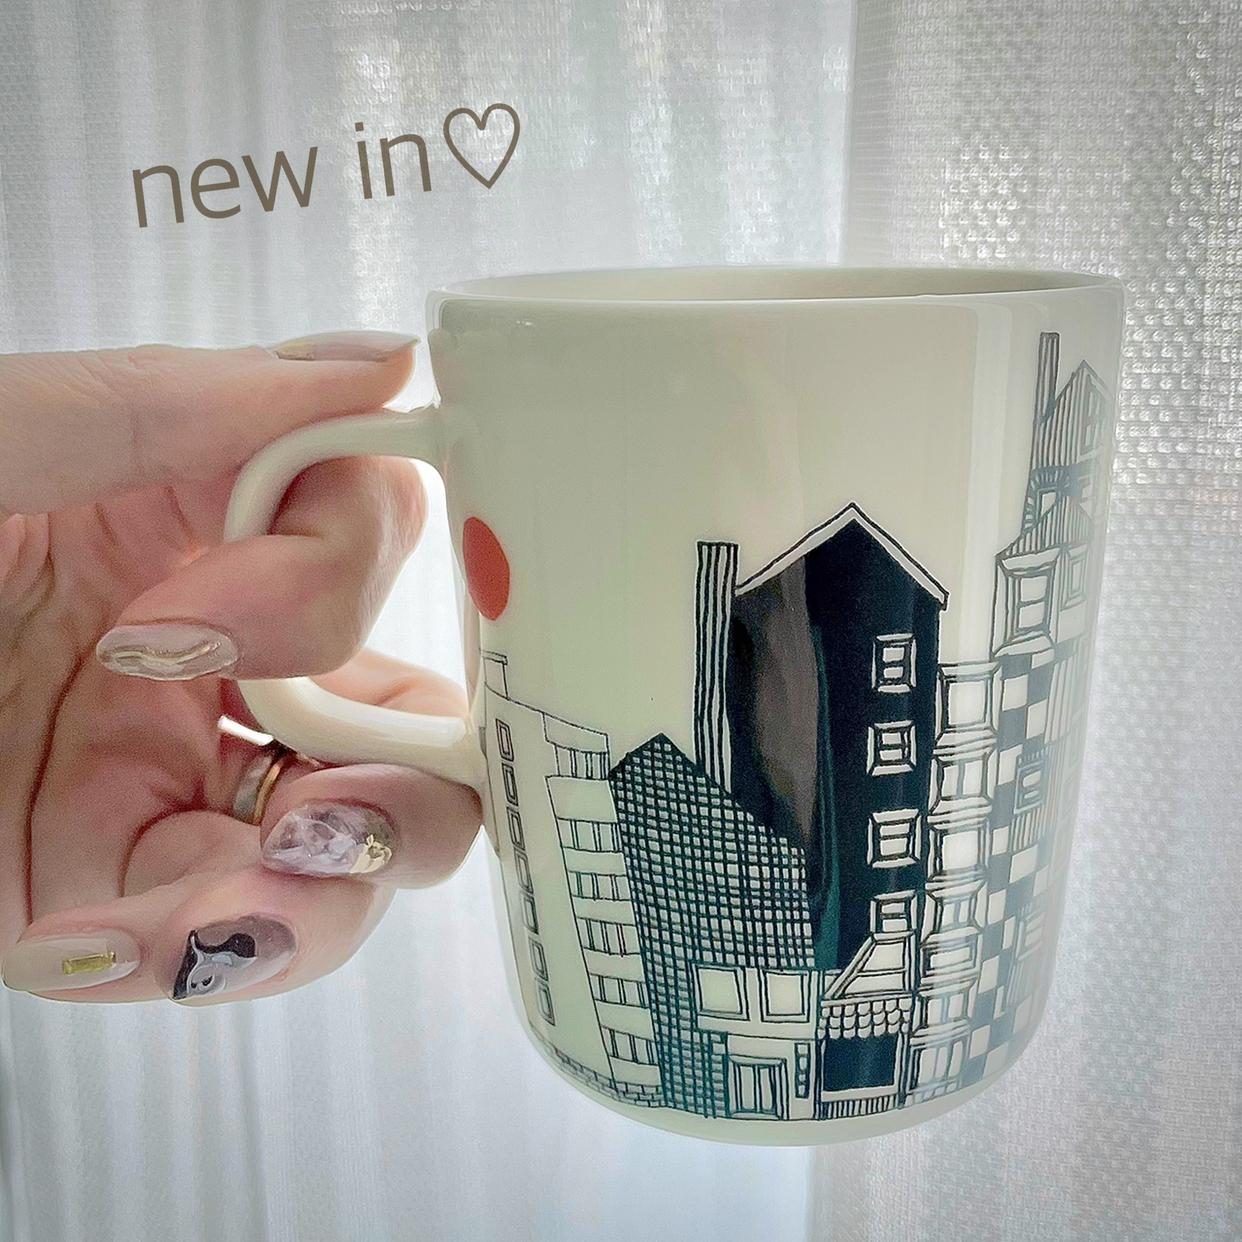 marimekko(マリメッコ)Unikko マグカップを使ったSaki.さんのクチコミ画像1